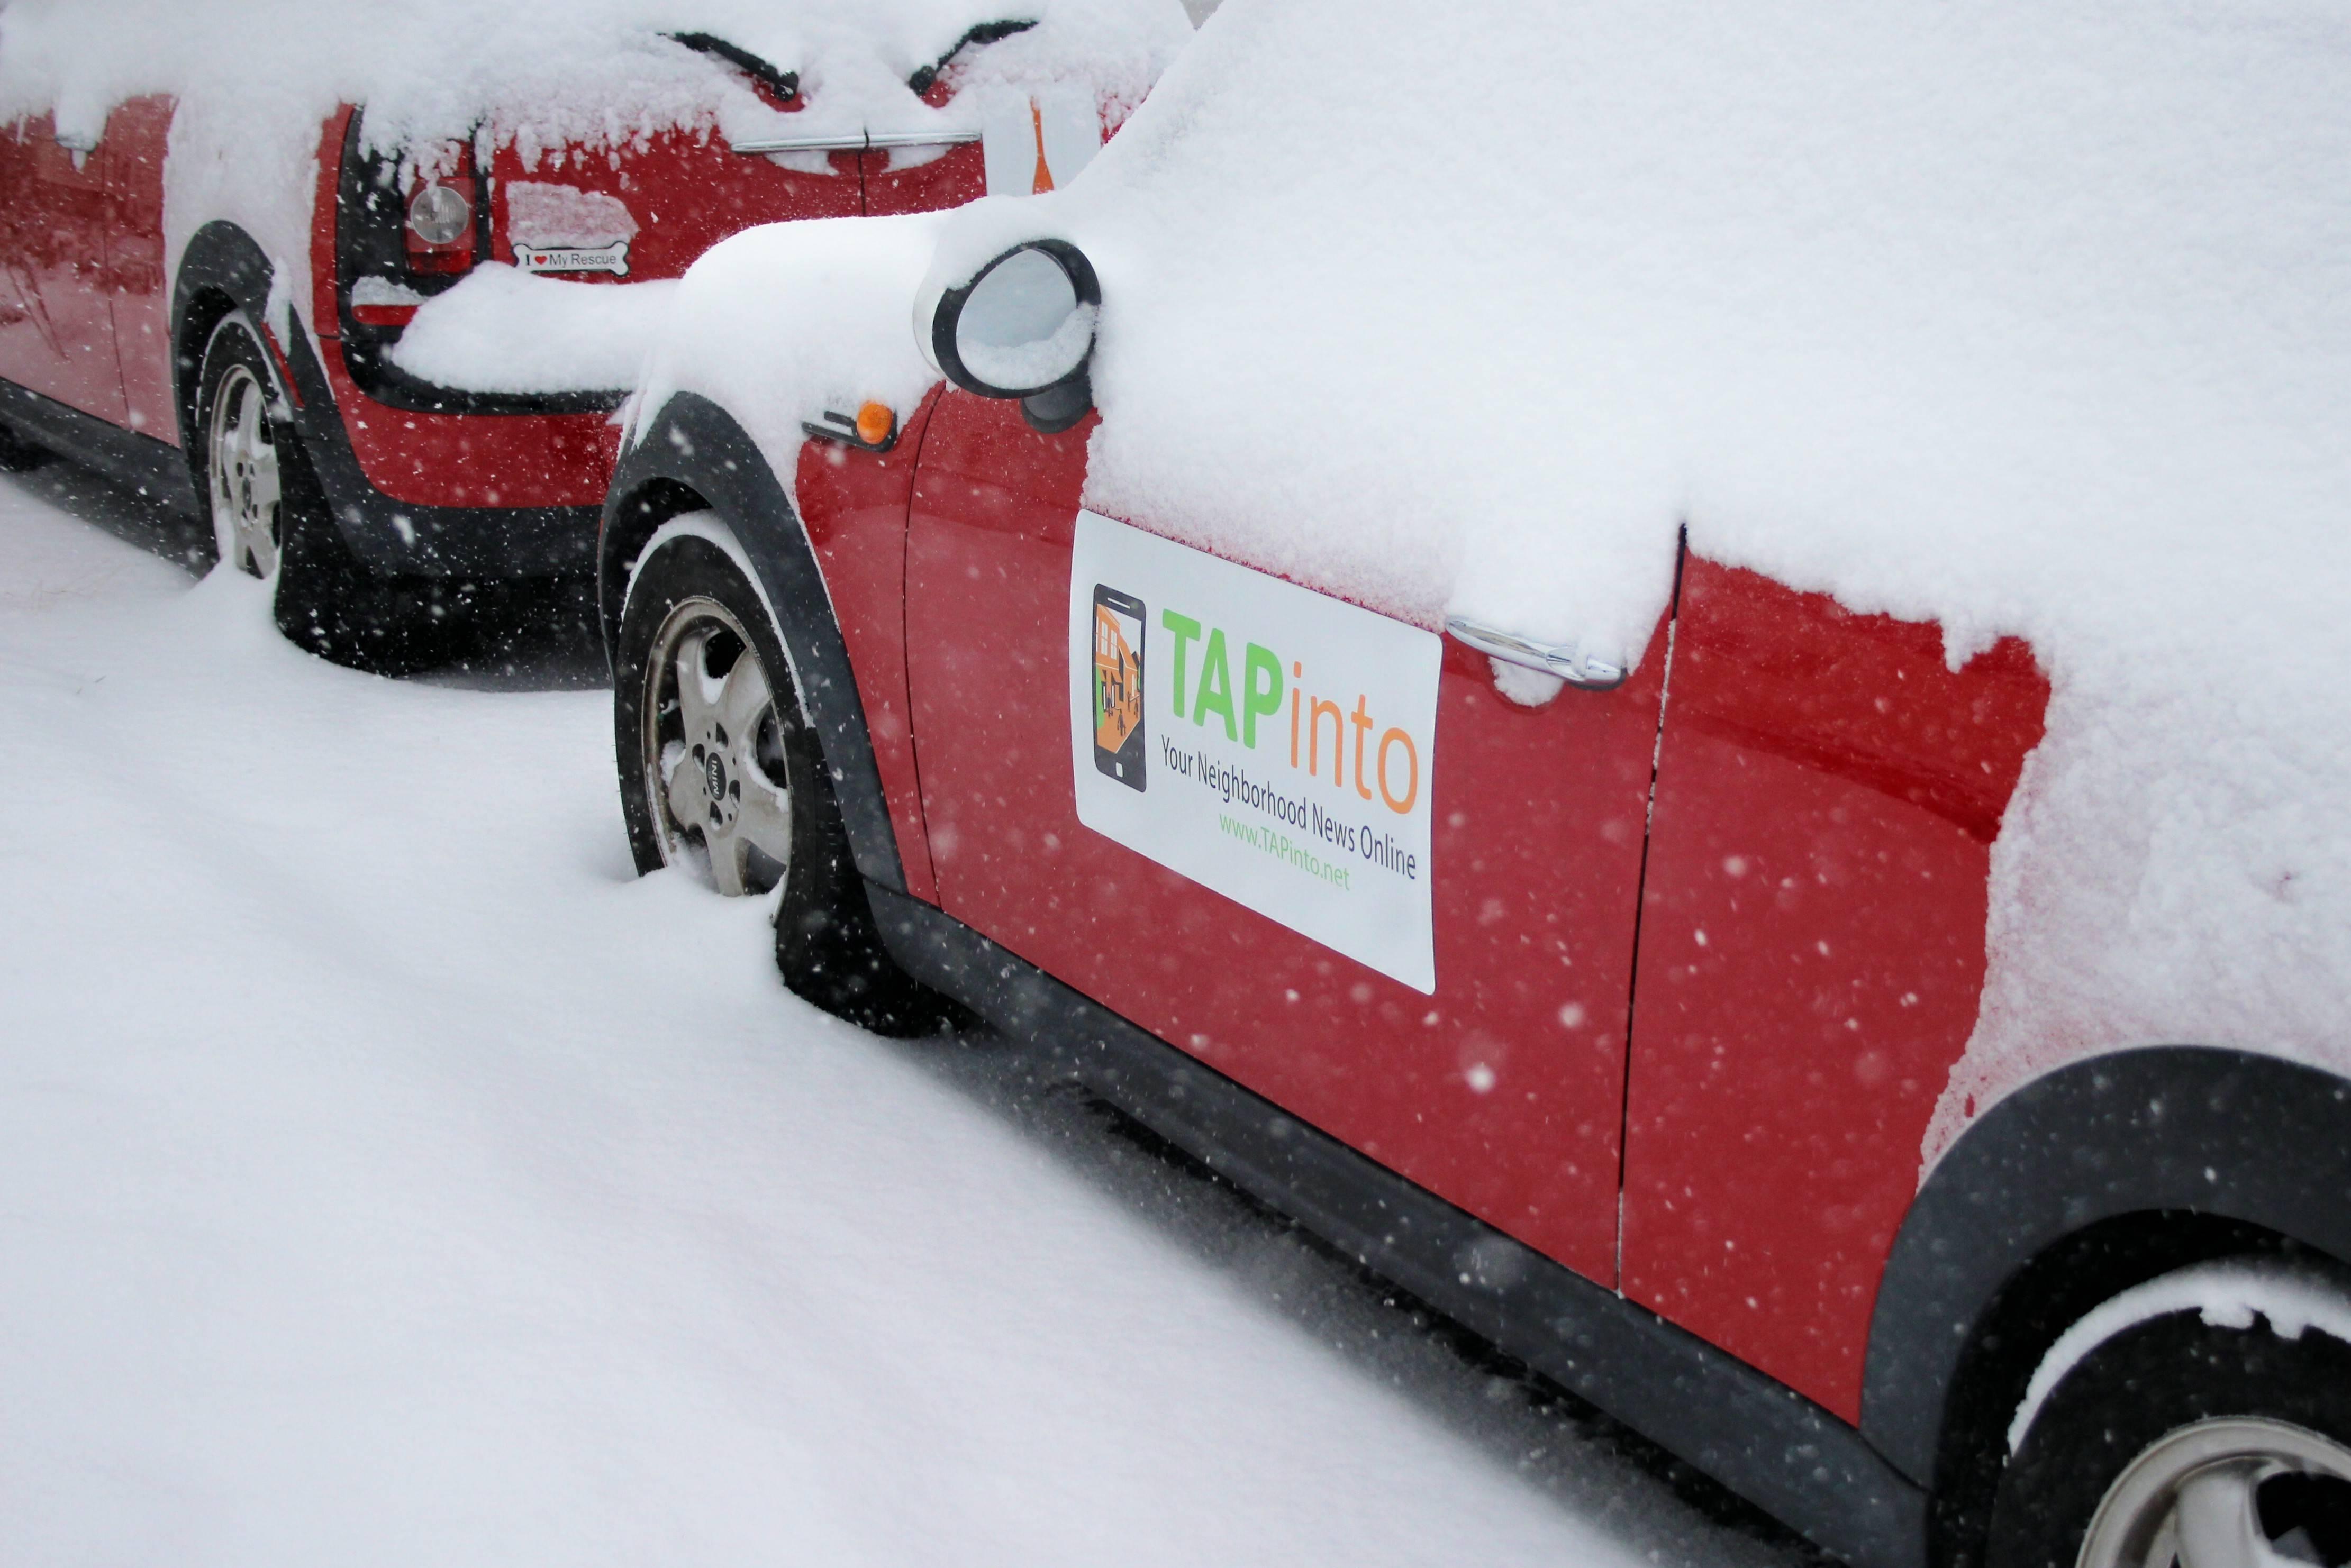 7a6c80013eed4bf11277_TAPinto_Mini_Cooper_Snow.jpg